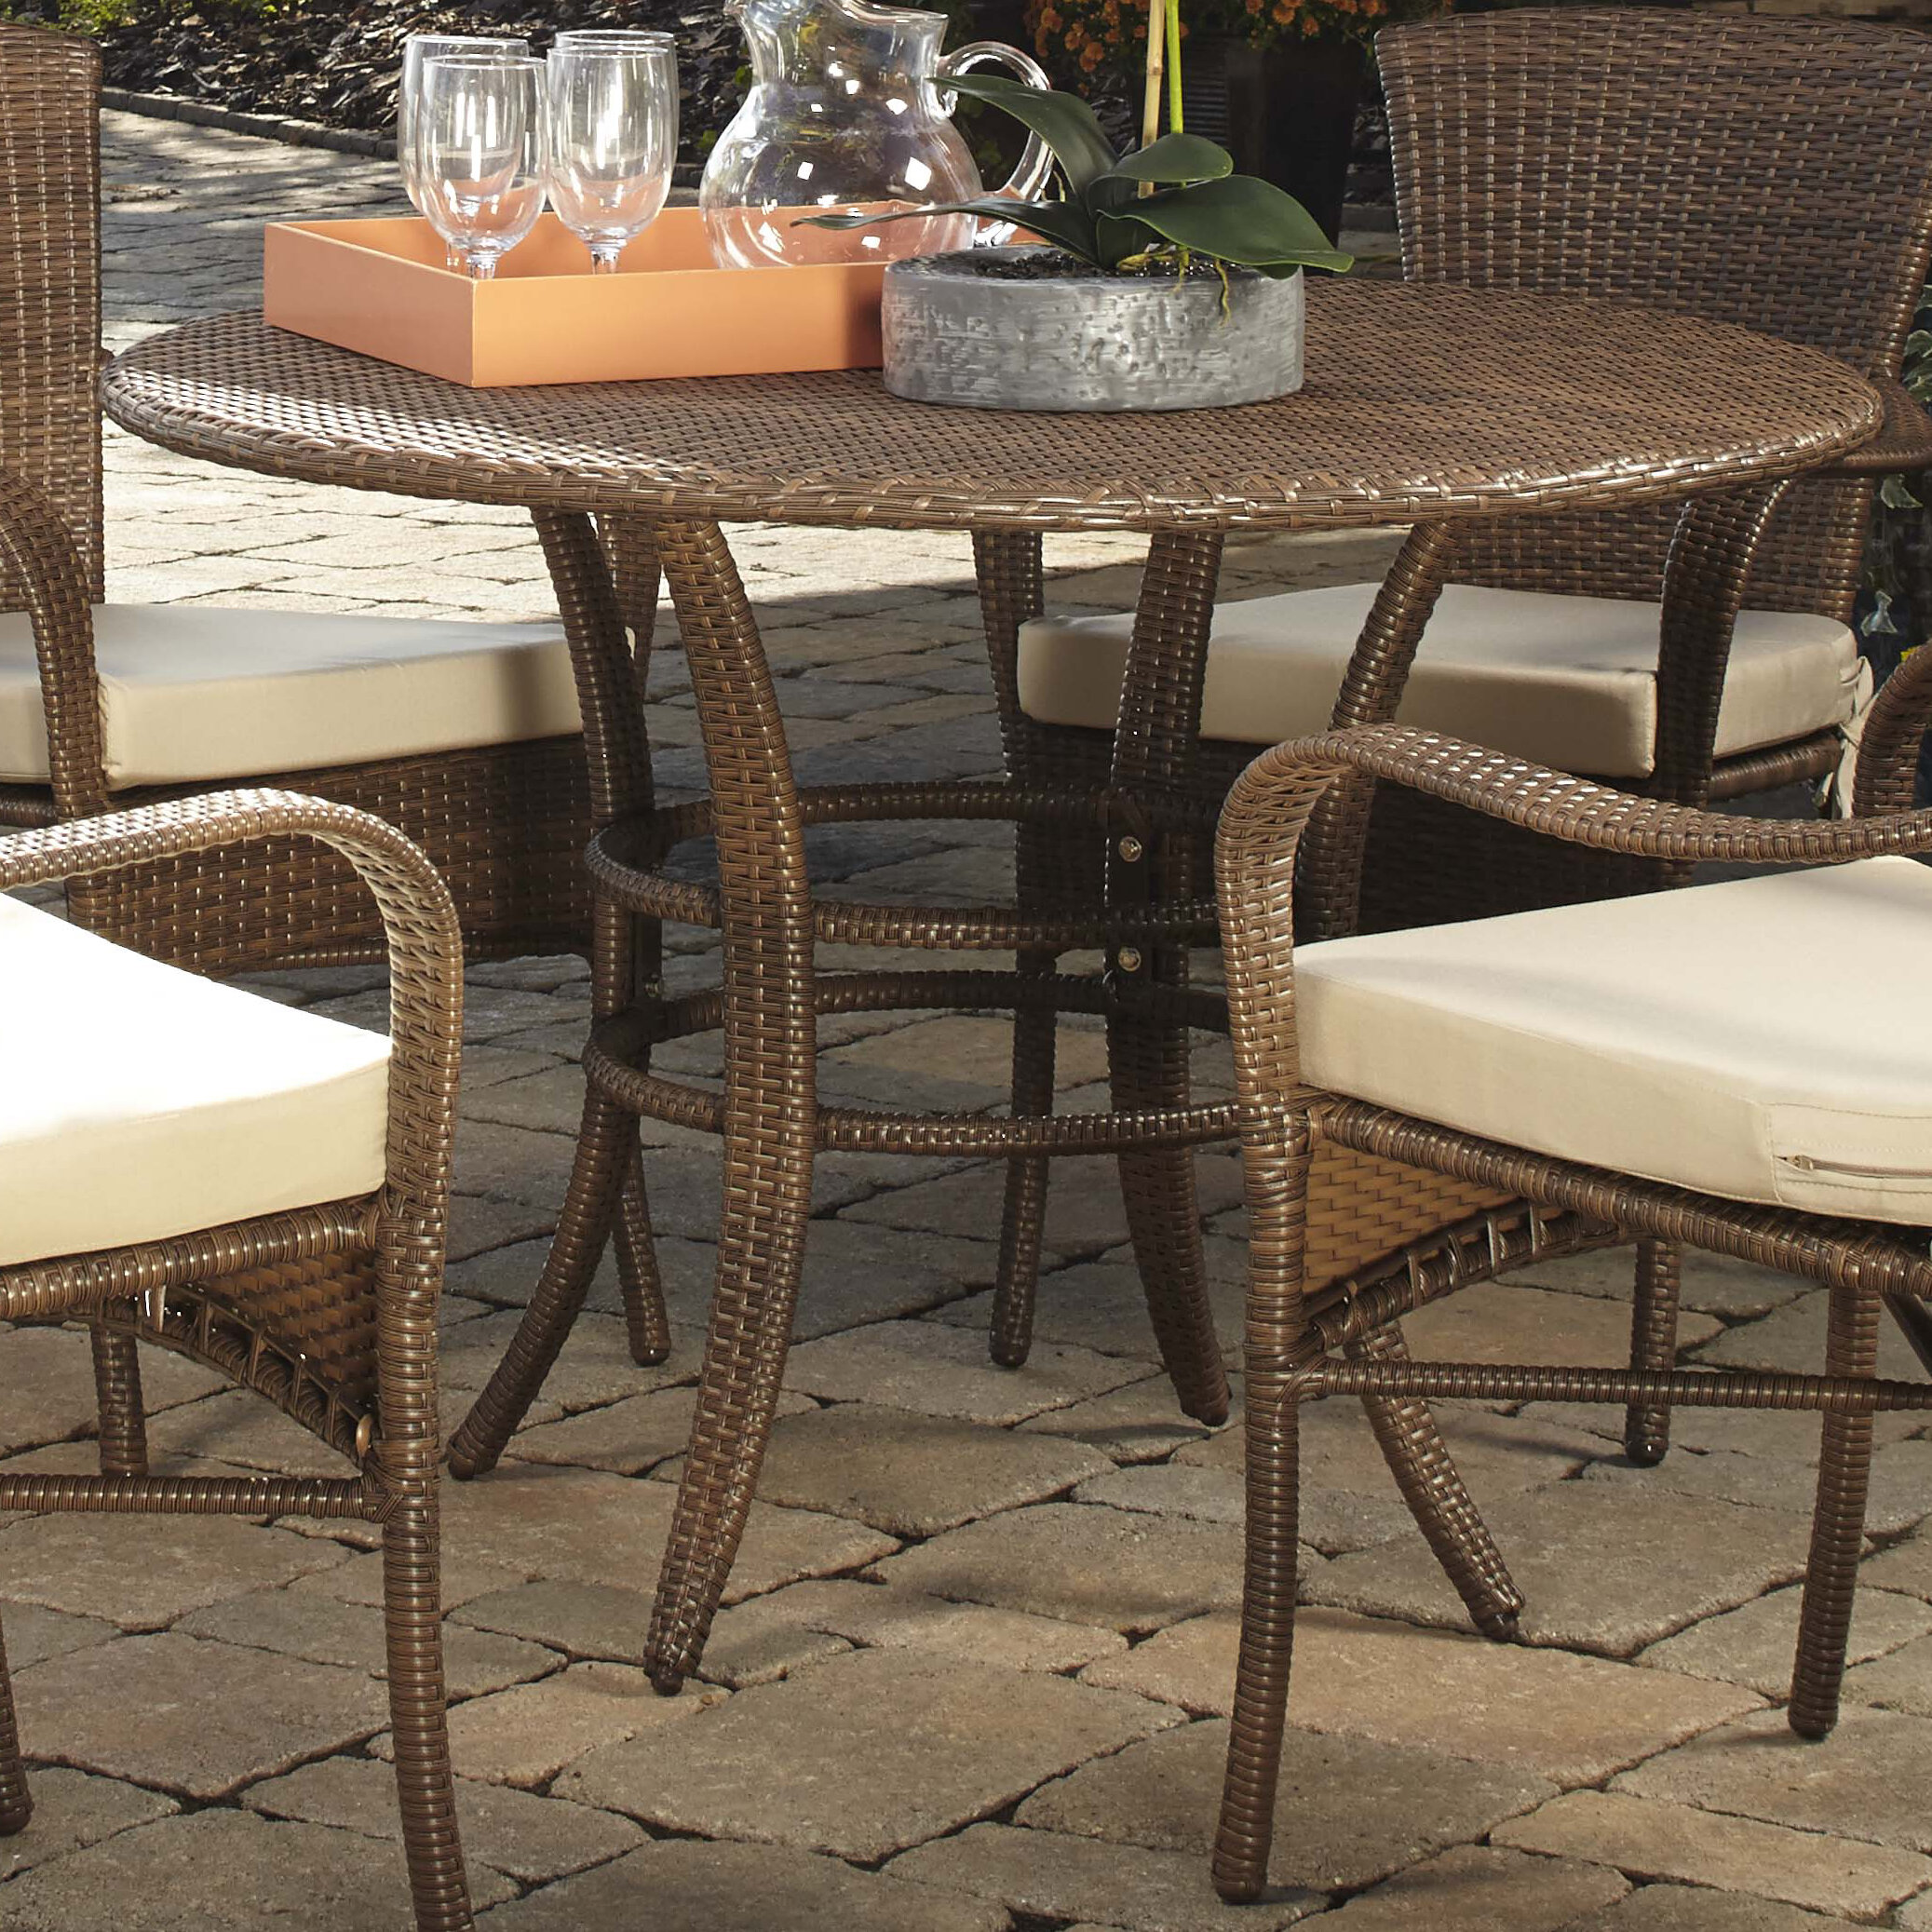 Key biscayne dining table reviews birch lane